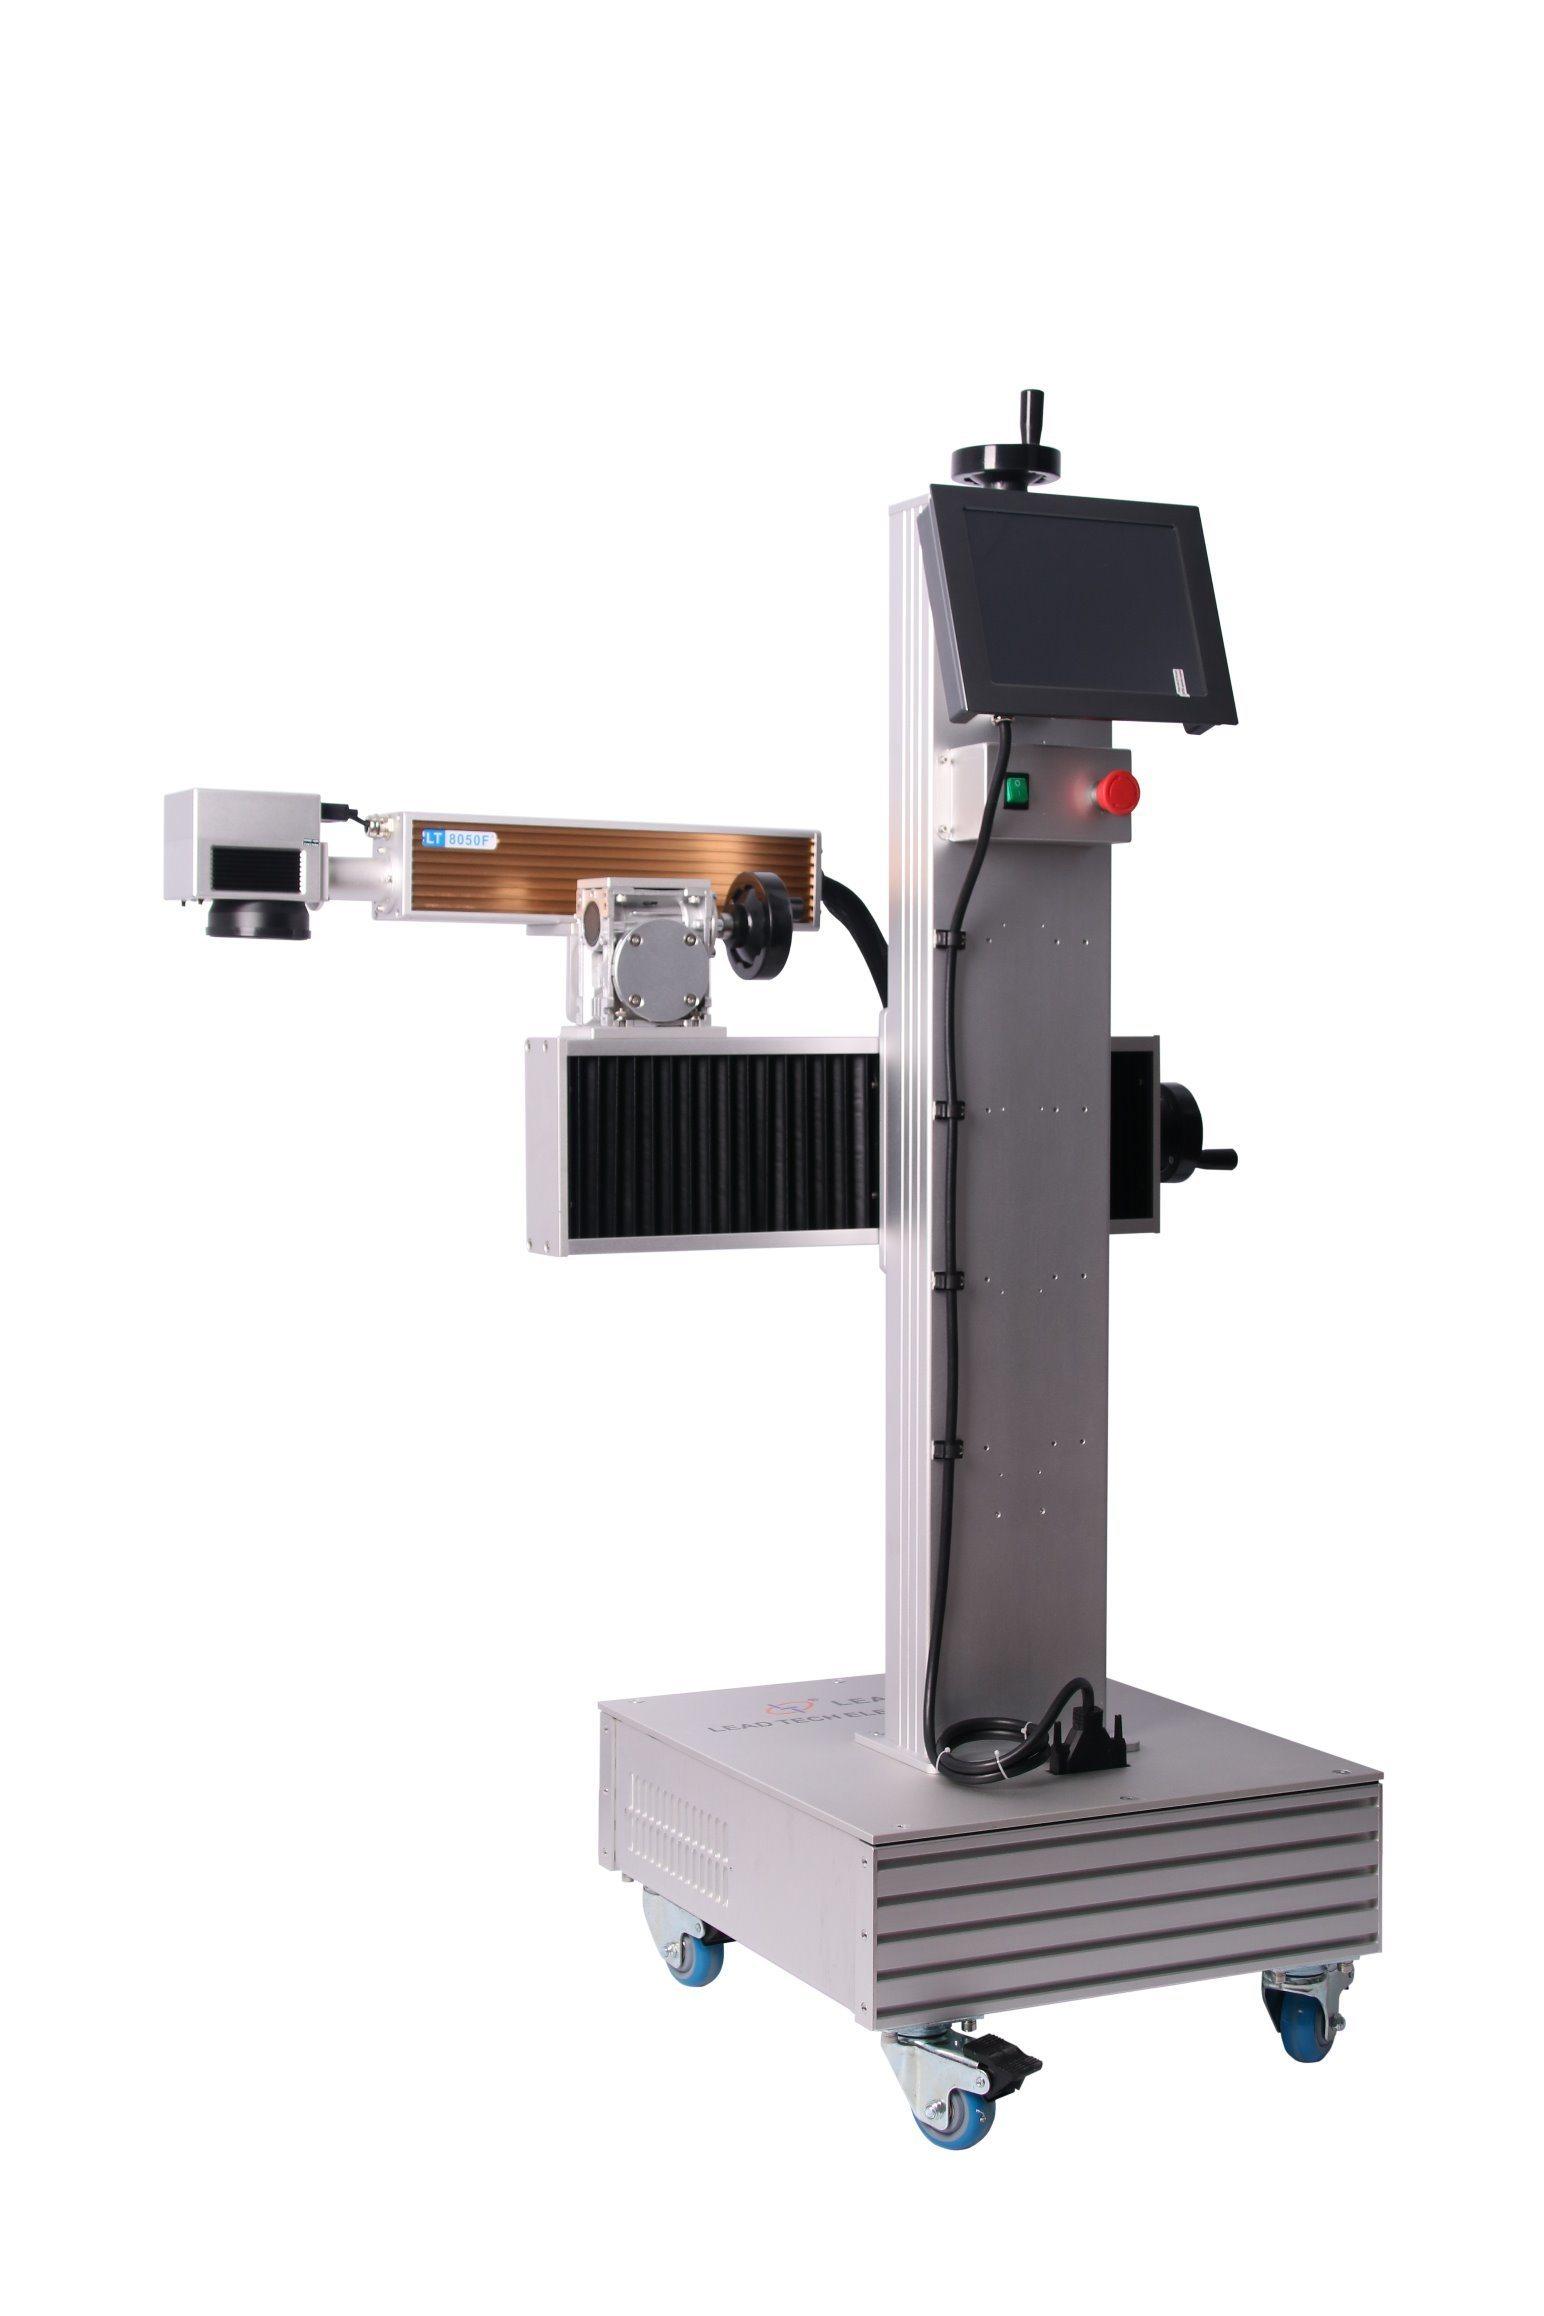 Lead Tech Lt8020f/Lt8030f/Lt8050f Fiber Digital Laser Marking Printer for Plate Silver Gold Printing